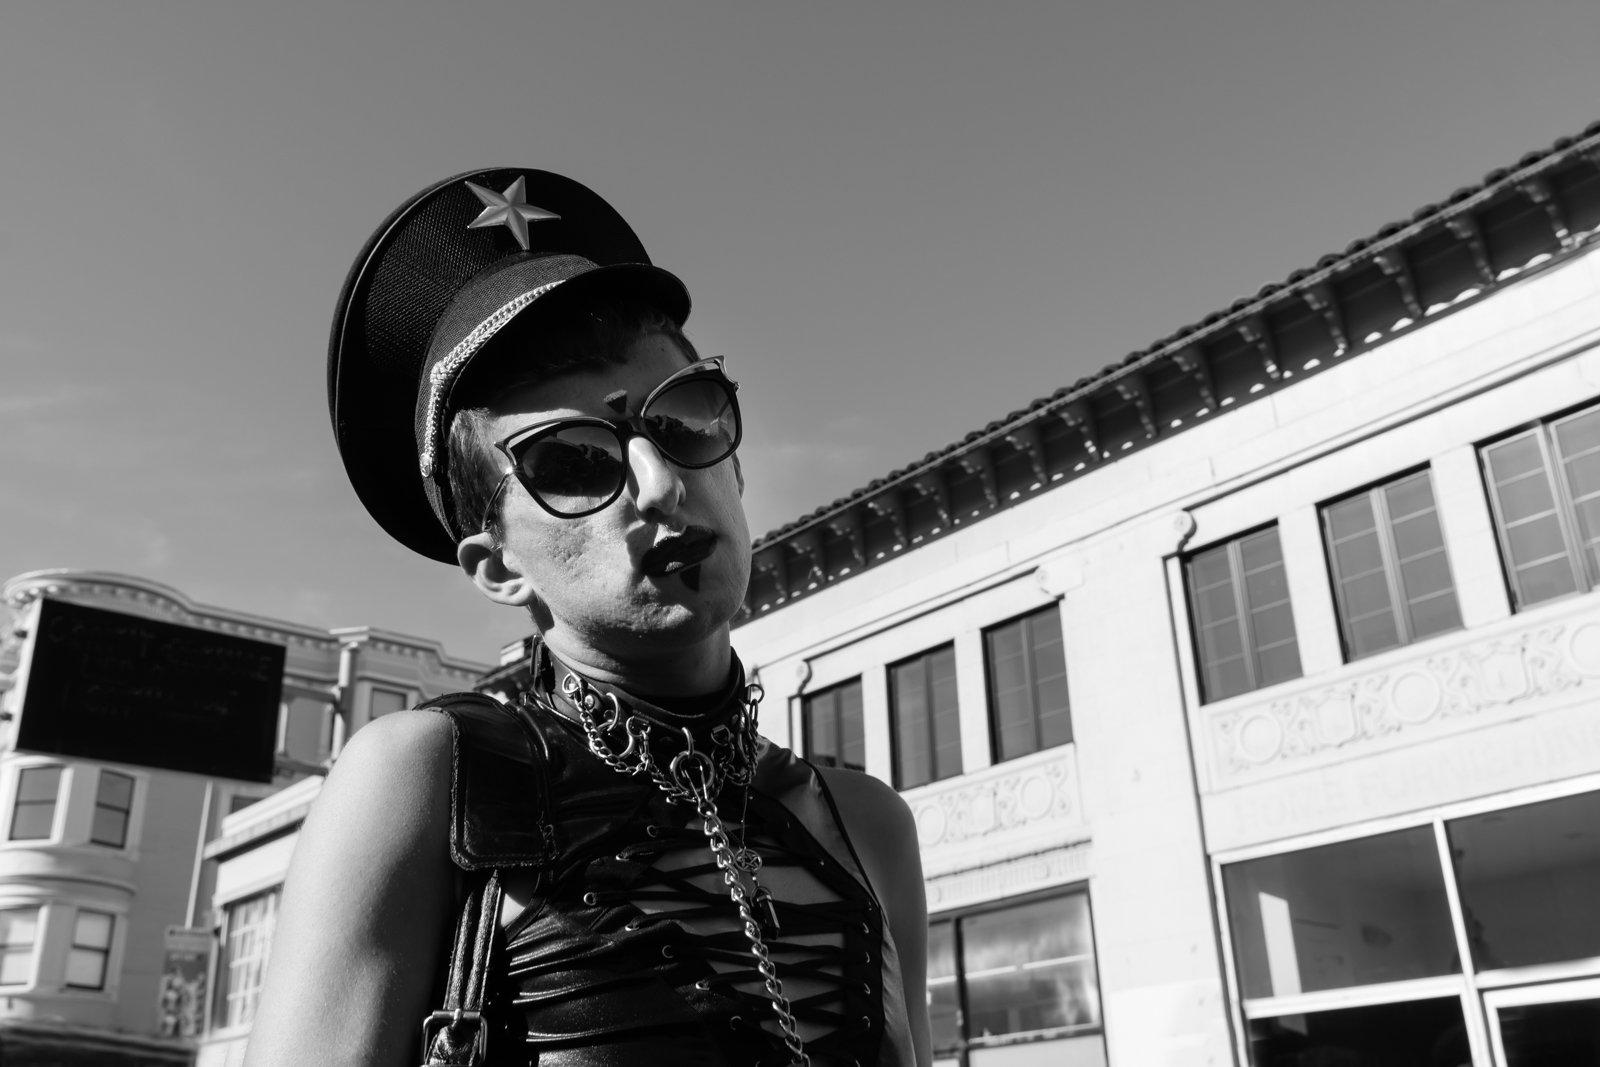 Eric Davidove Captures the Faces of San Francisco's BDSM Culture